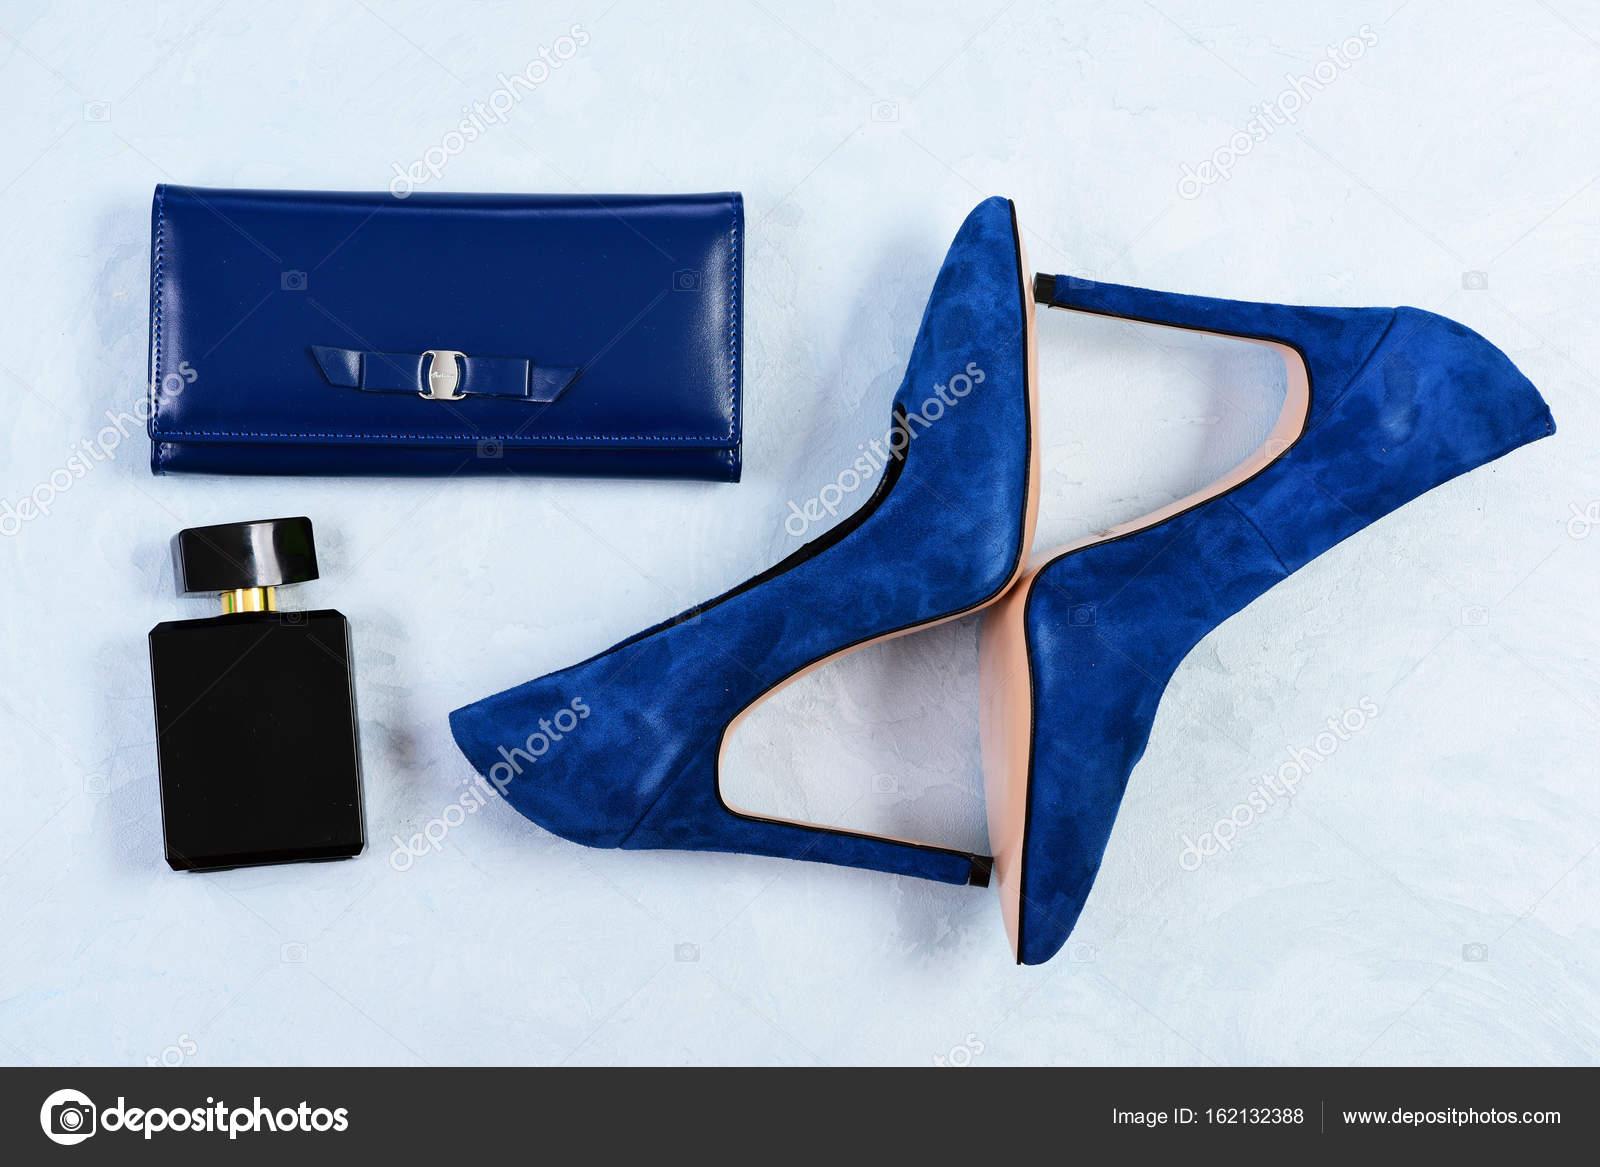 c0c0463a174 Ζευγάρι γυναικεία παπούτσια φανταχτερό σουέτ, topview. Παπούτσια και ...